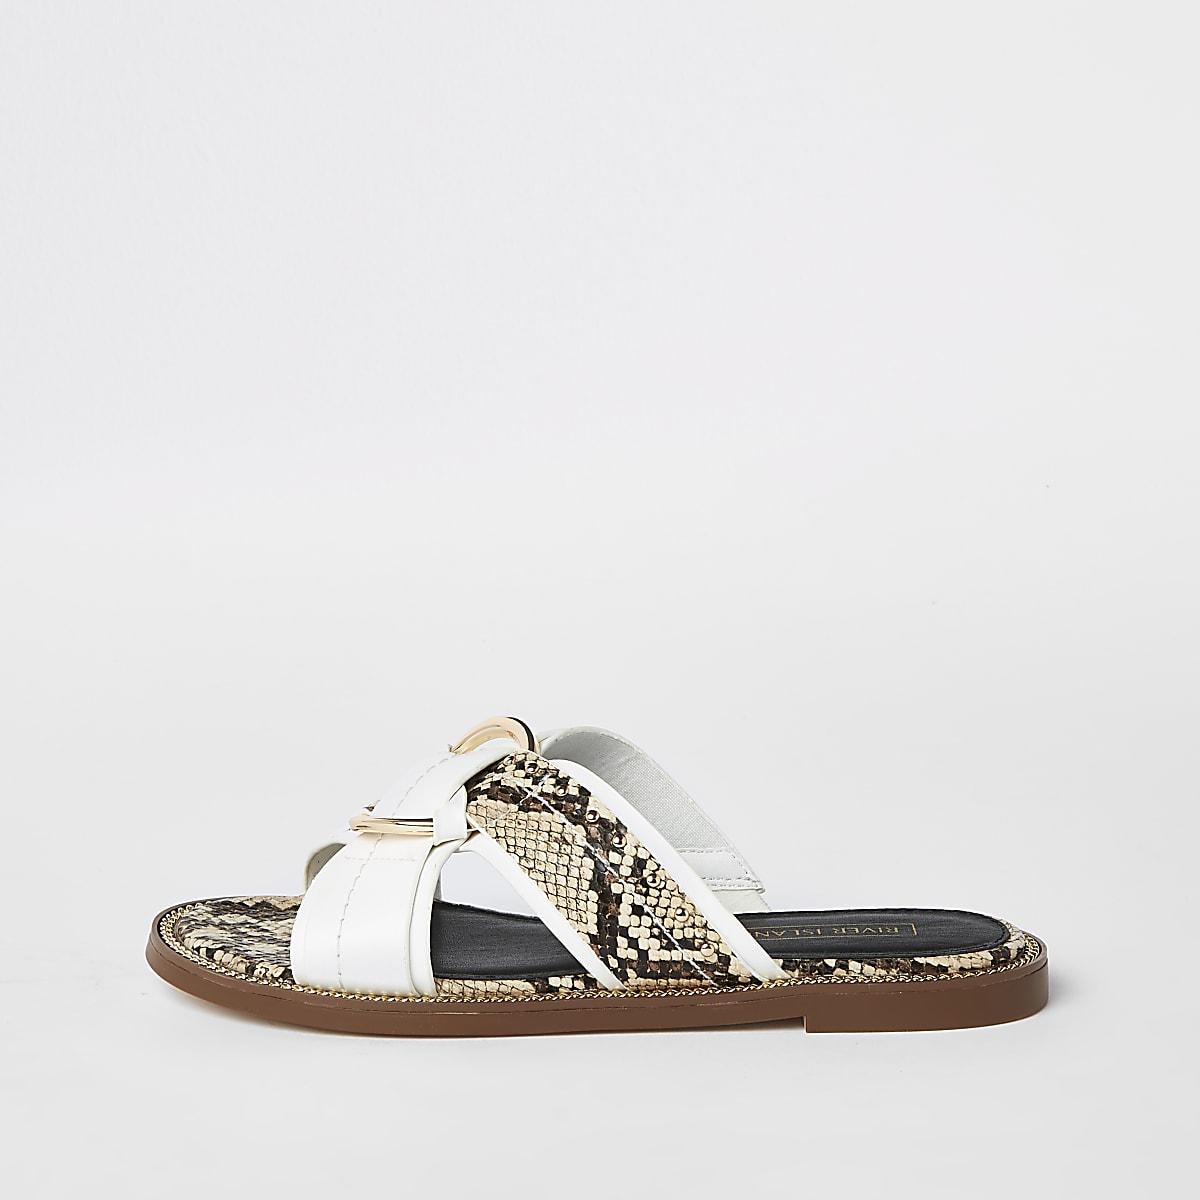 Witte platte sandalen met gekruiste bandjes en ring